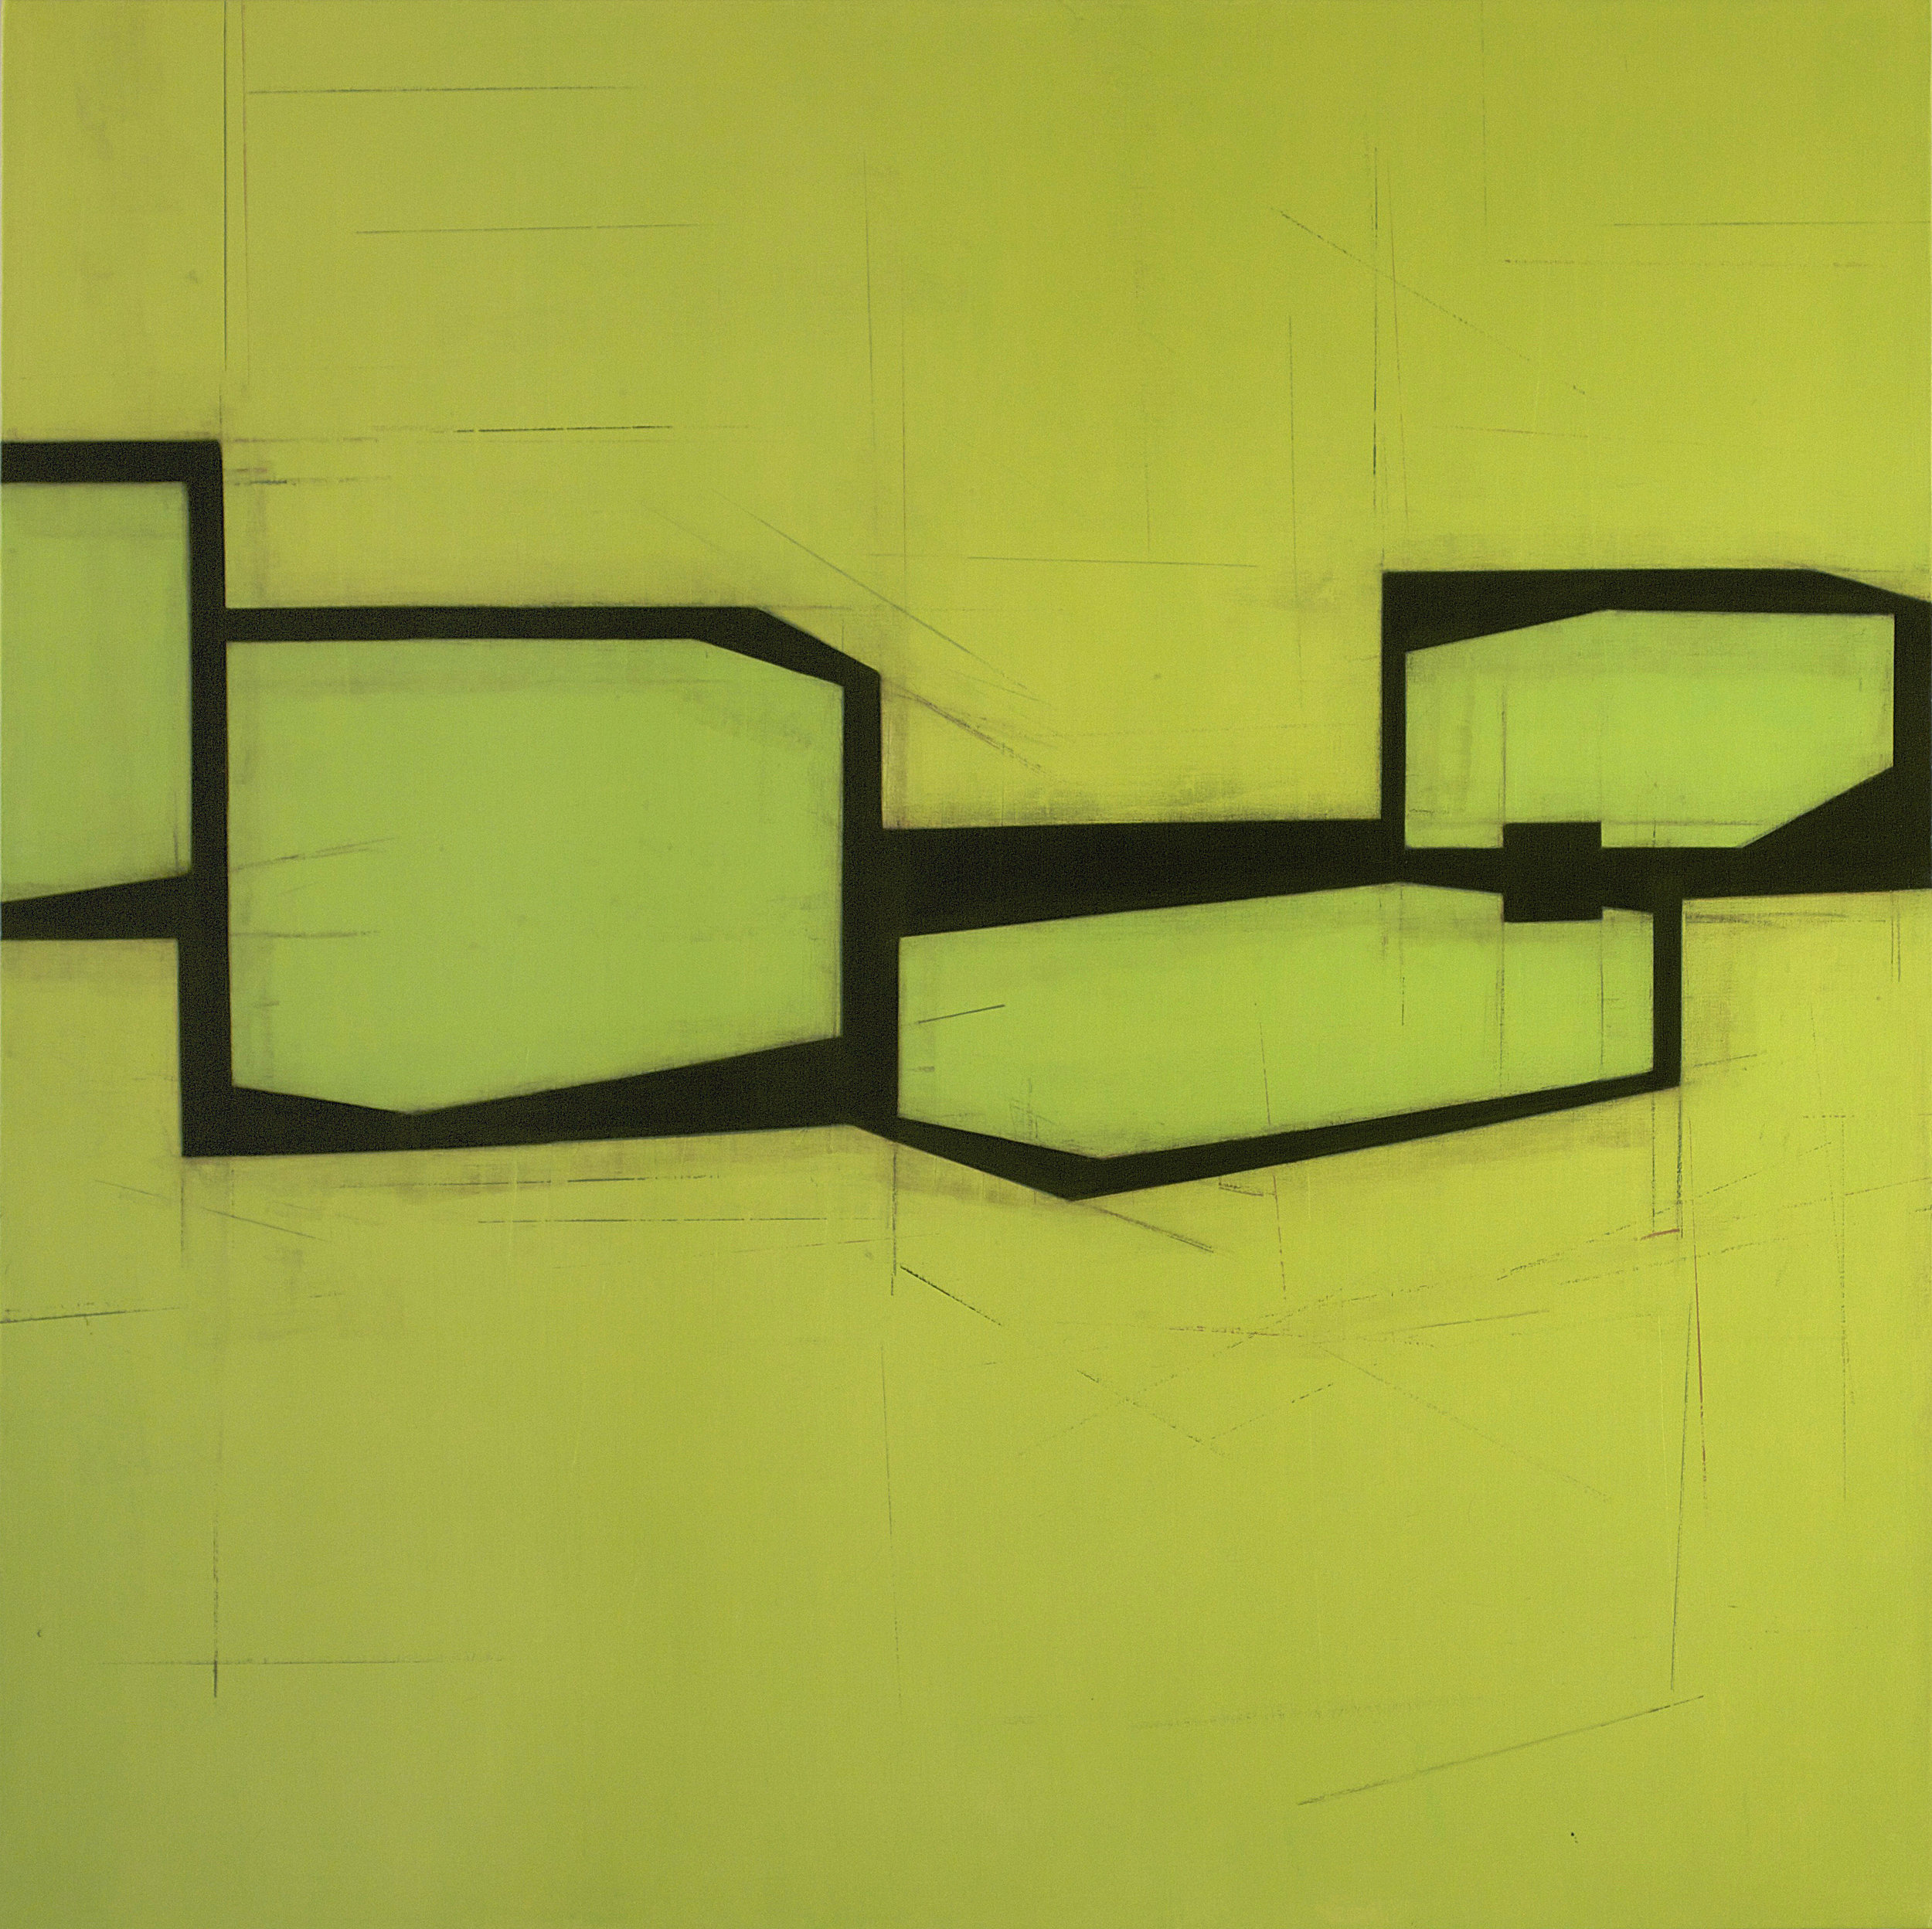 Drift E2 | 2015 | oil on canvas | 48 x 48 inches